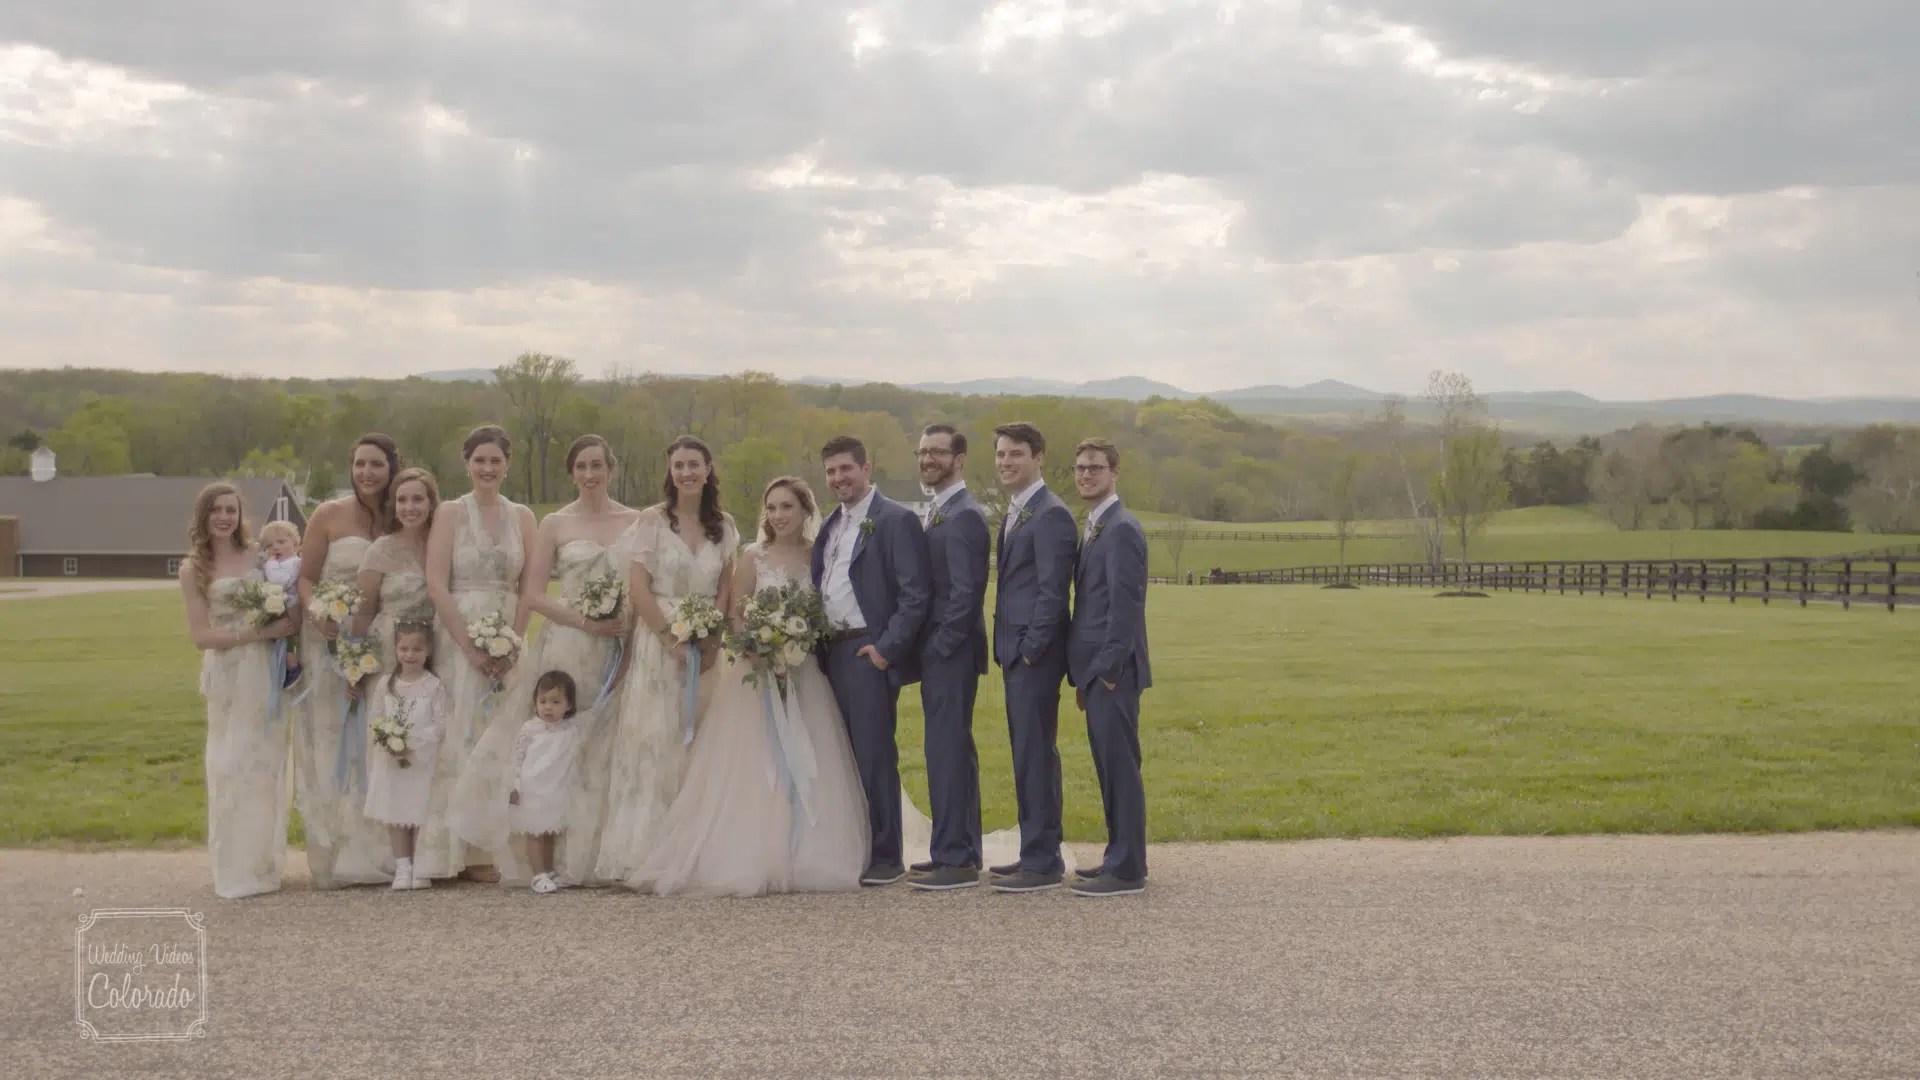 Tony Steph Wedding Still The Lodge at Mount Ida Charlottesville VirginiaTony Steph Wedding Still The Lodge at Mount Ida Charlottesville Virginia